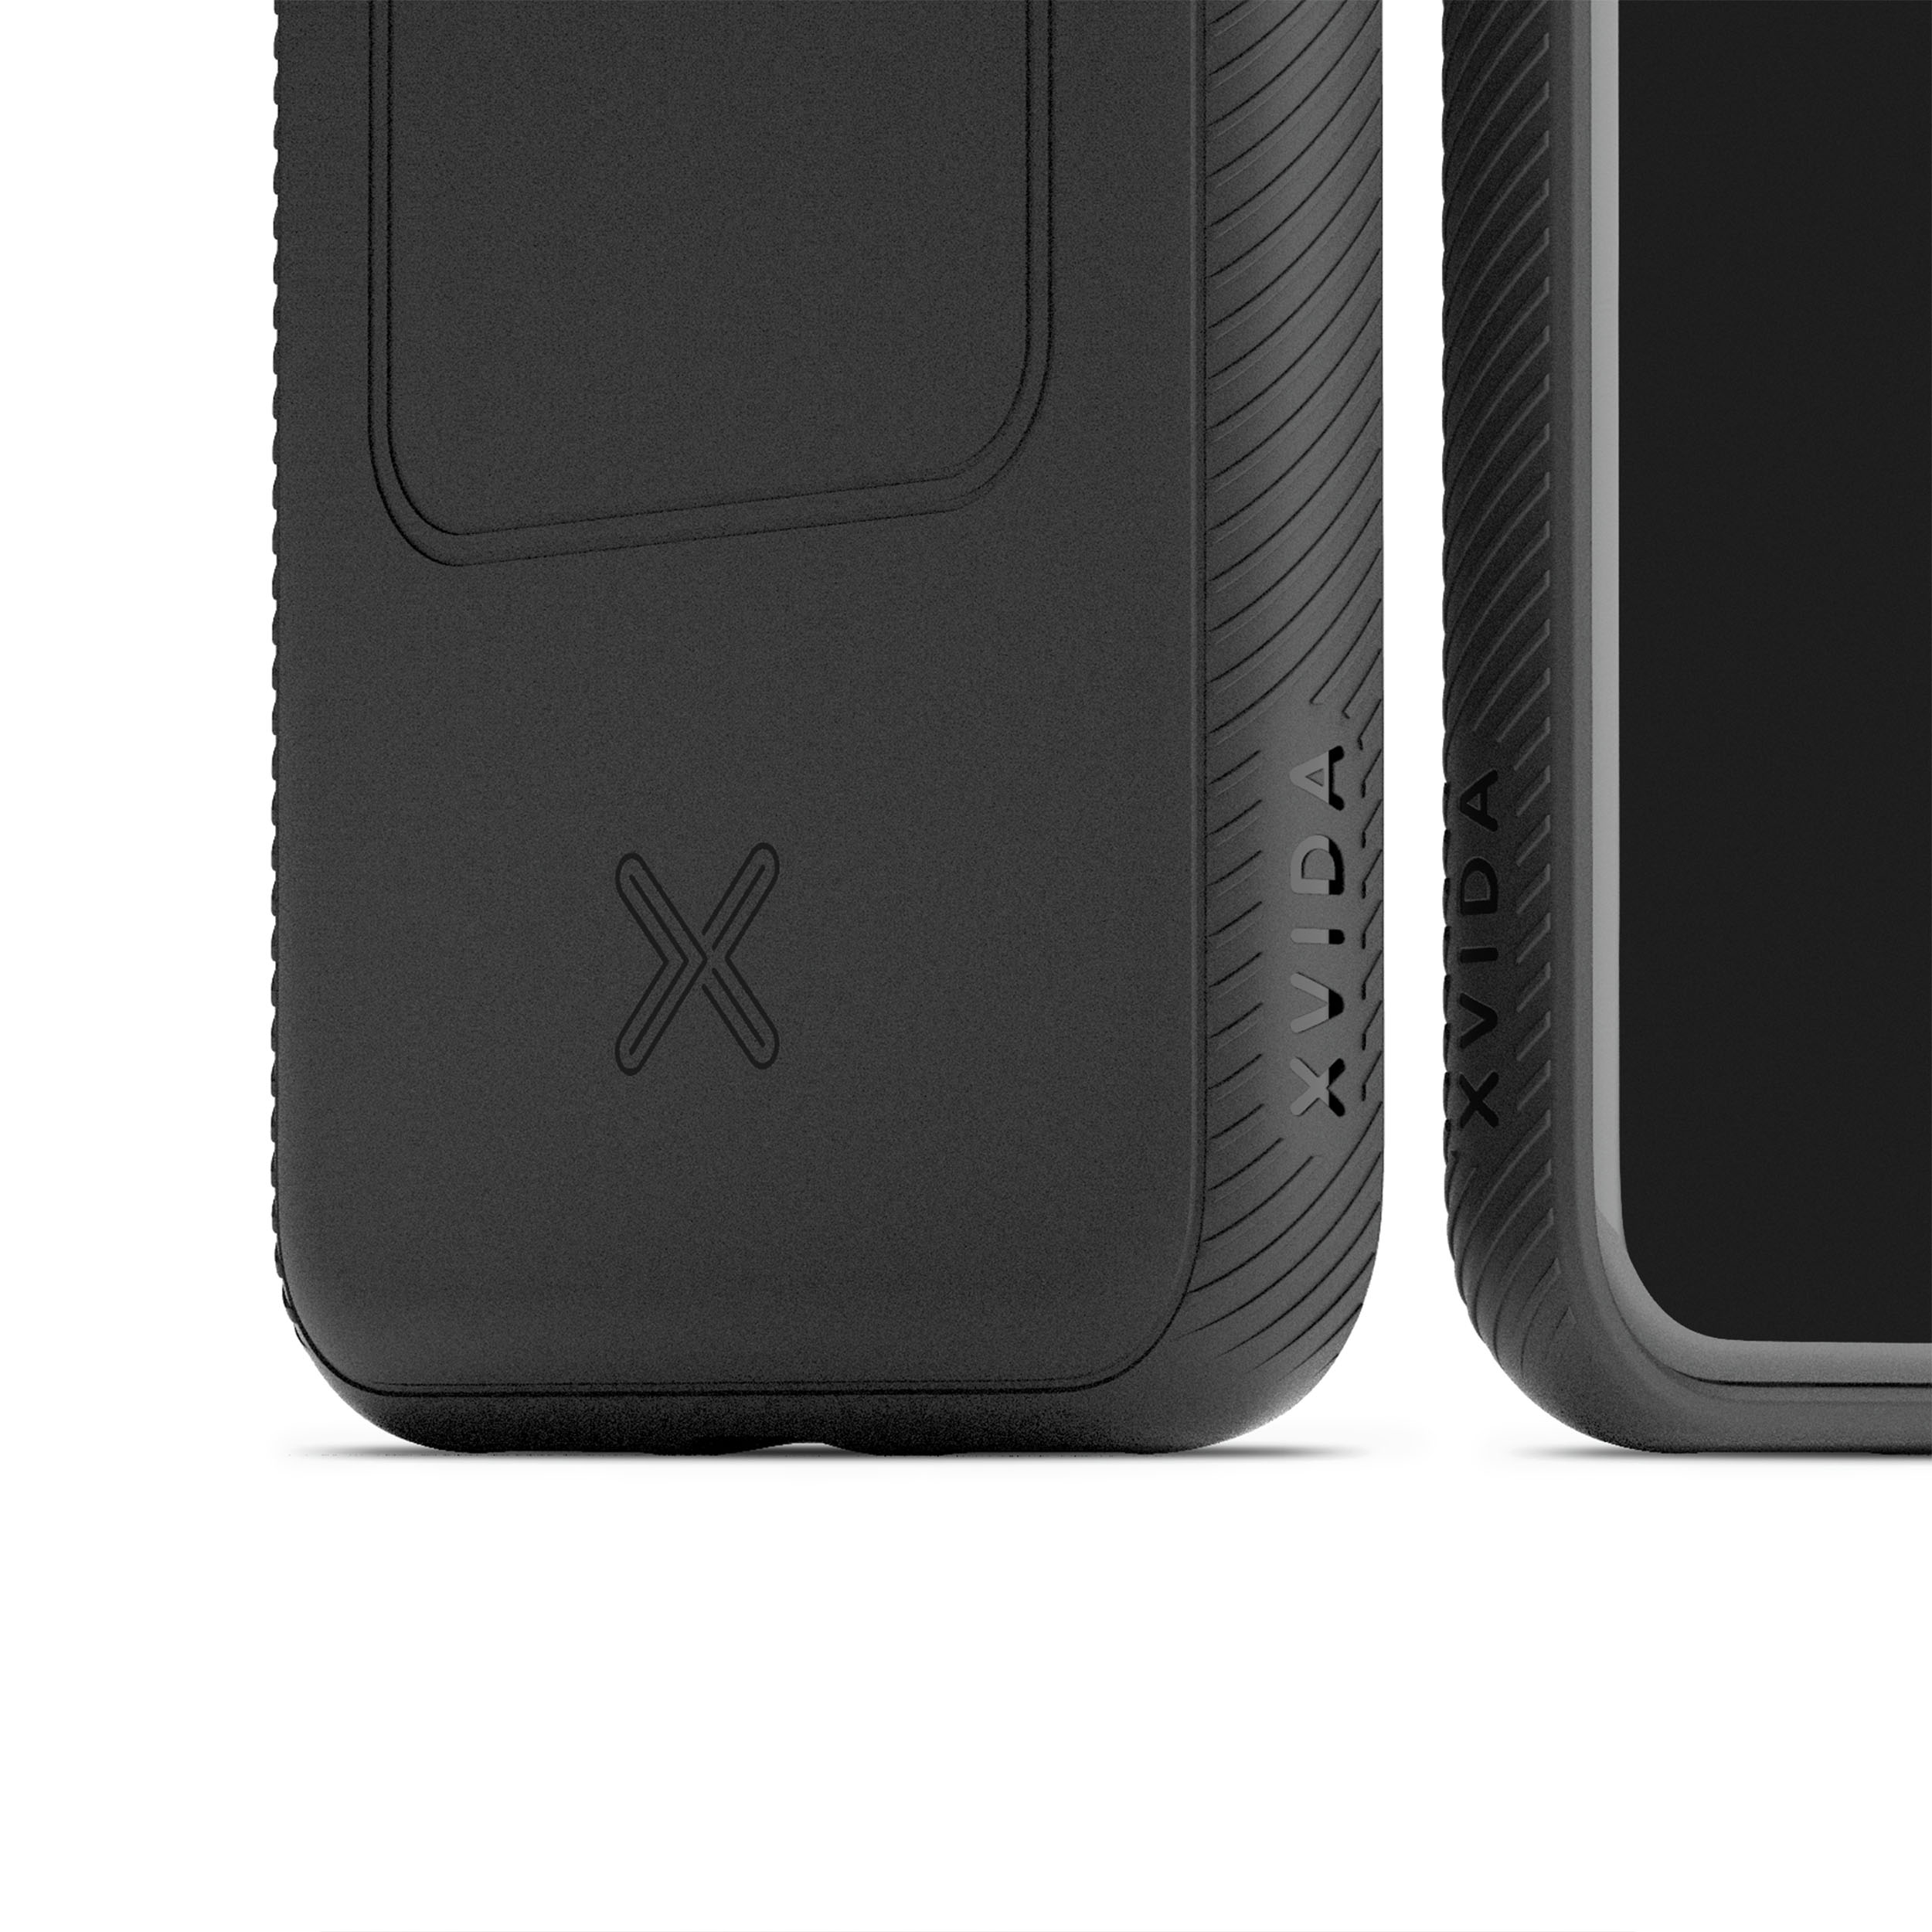 Magnetic Wireless Case iPhone XS Schutzhülle